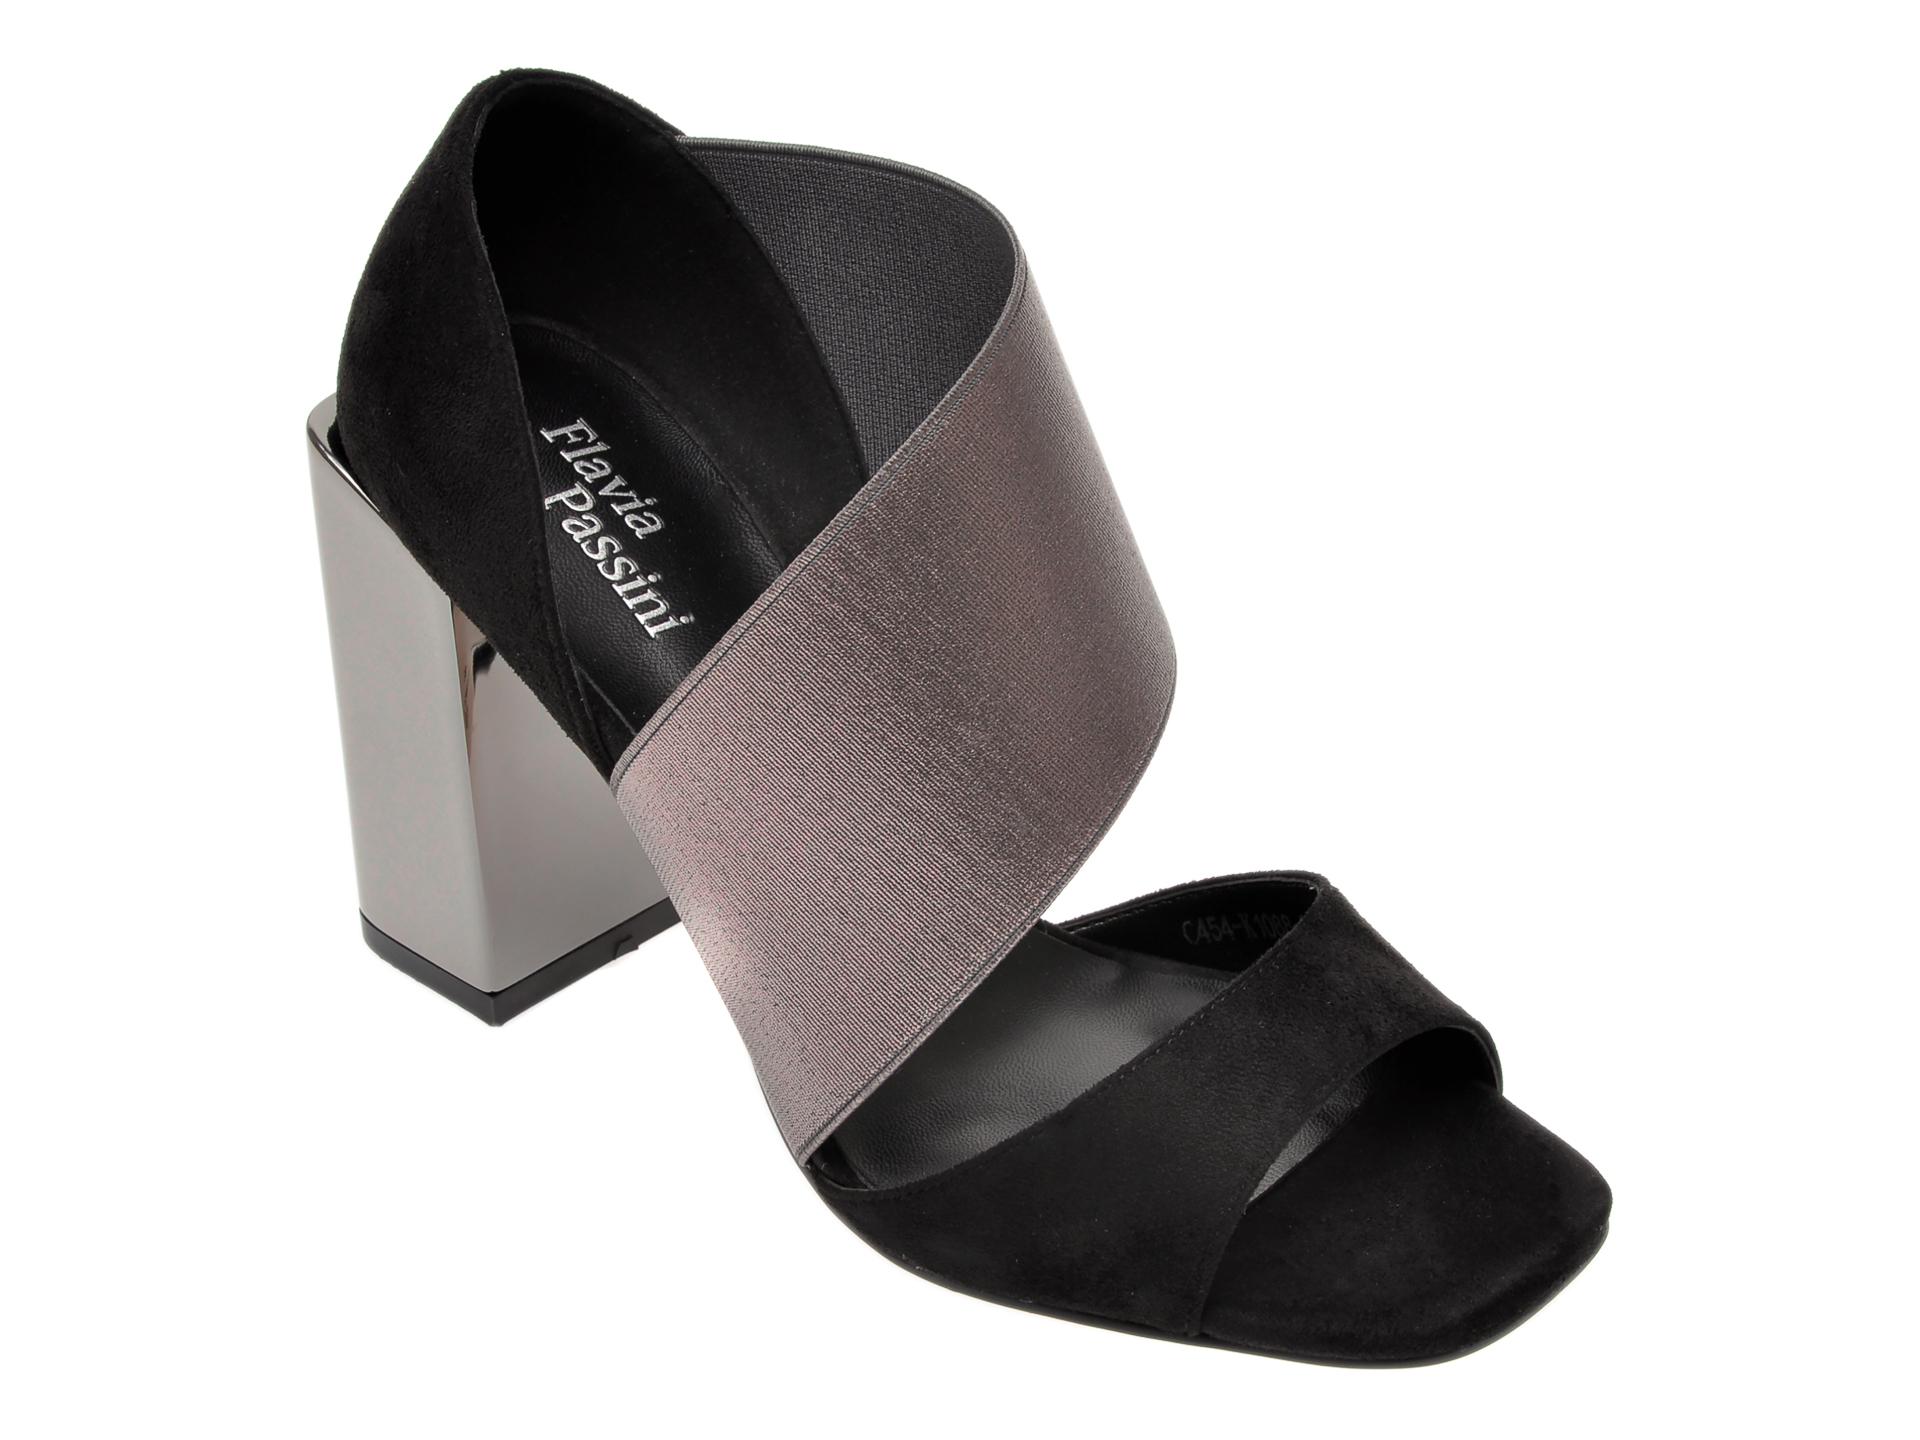 Sandale FLAVIA PASSINI negre, C454K10, din piele ecologica si material textil